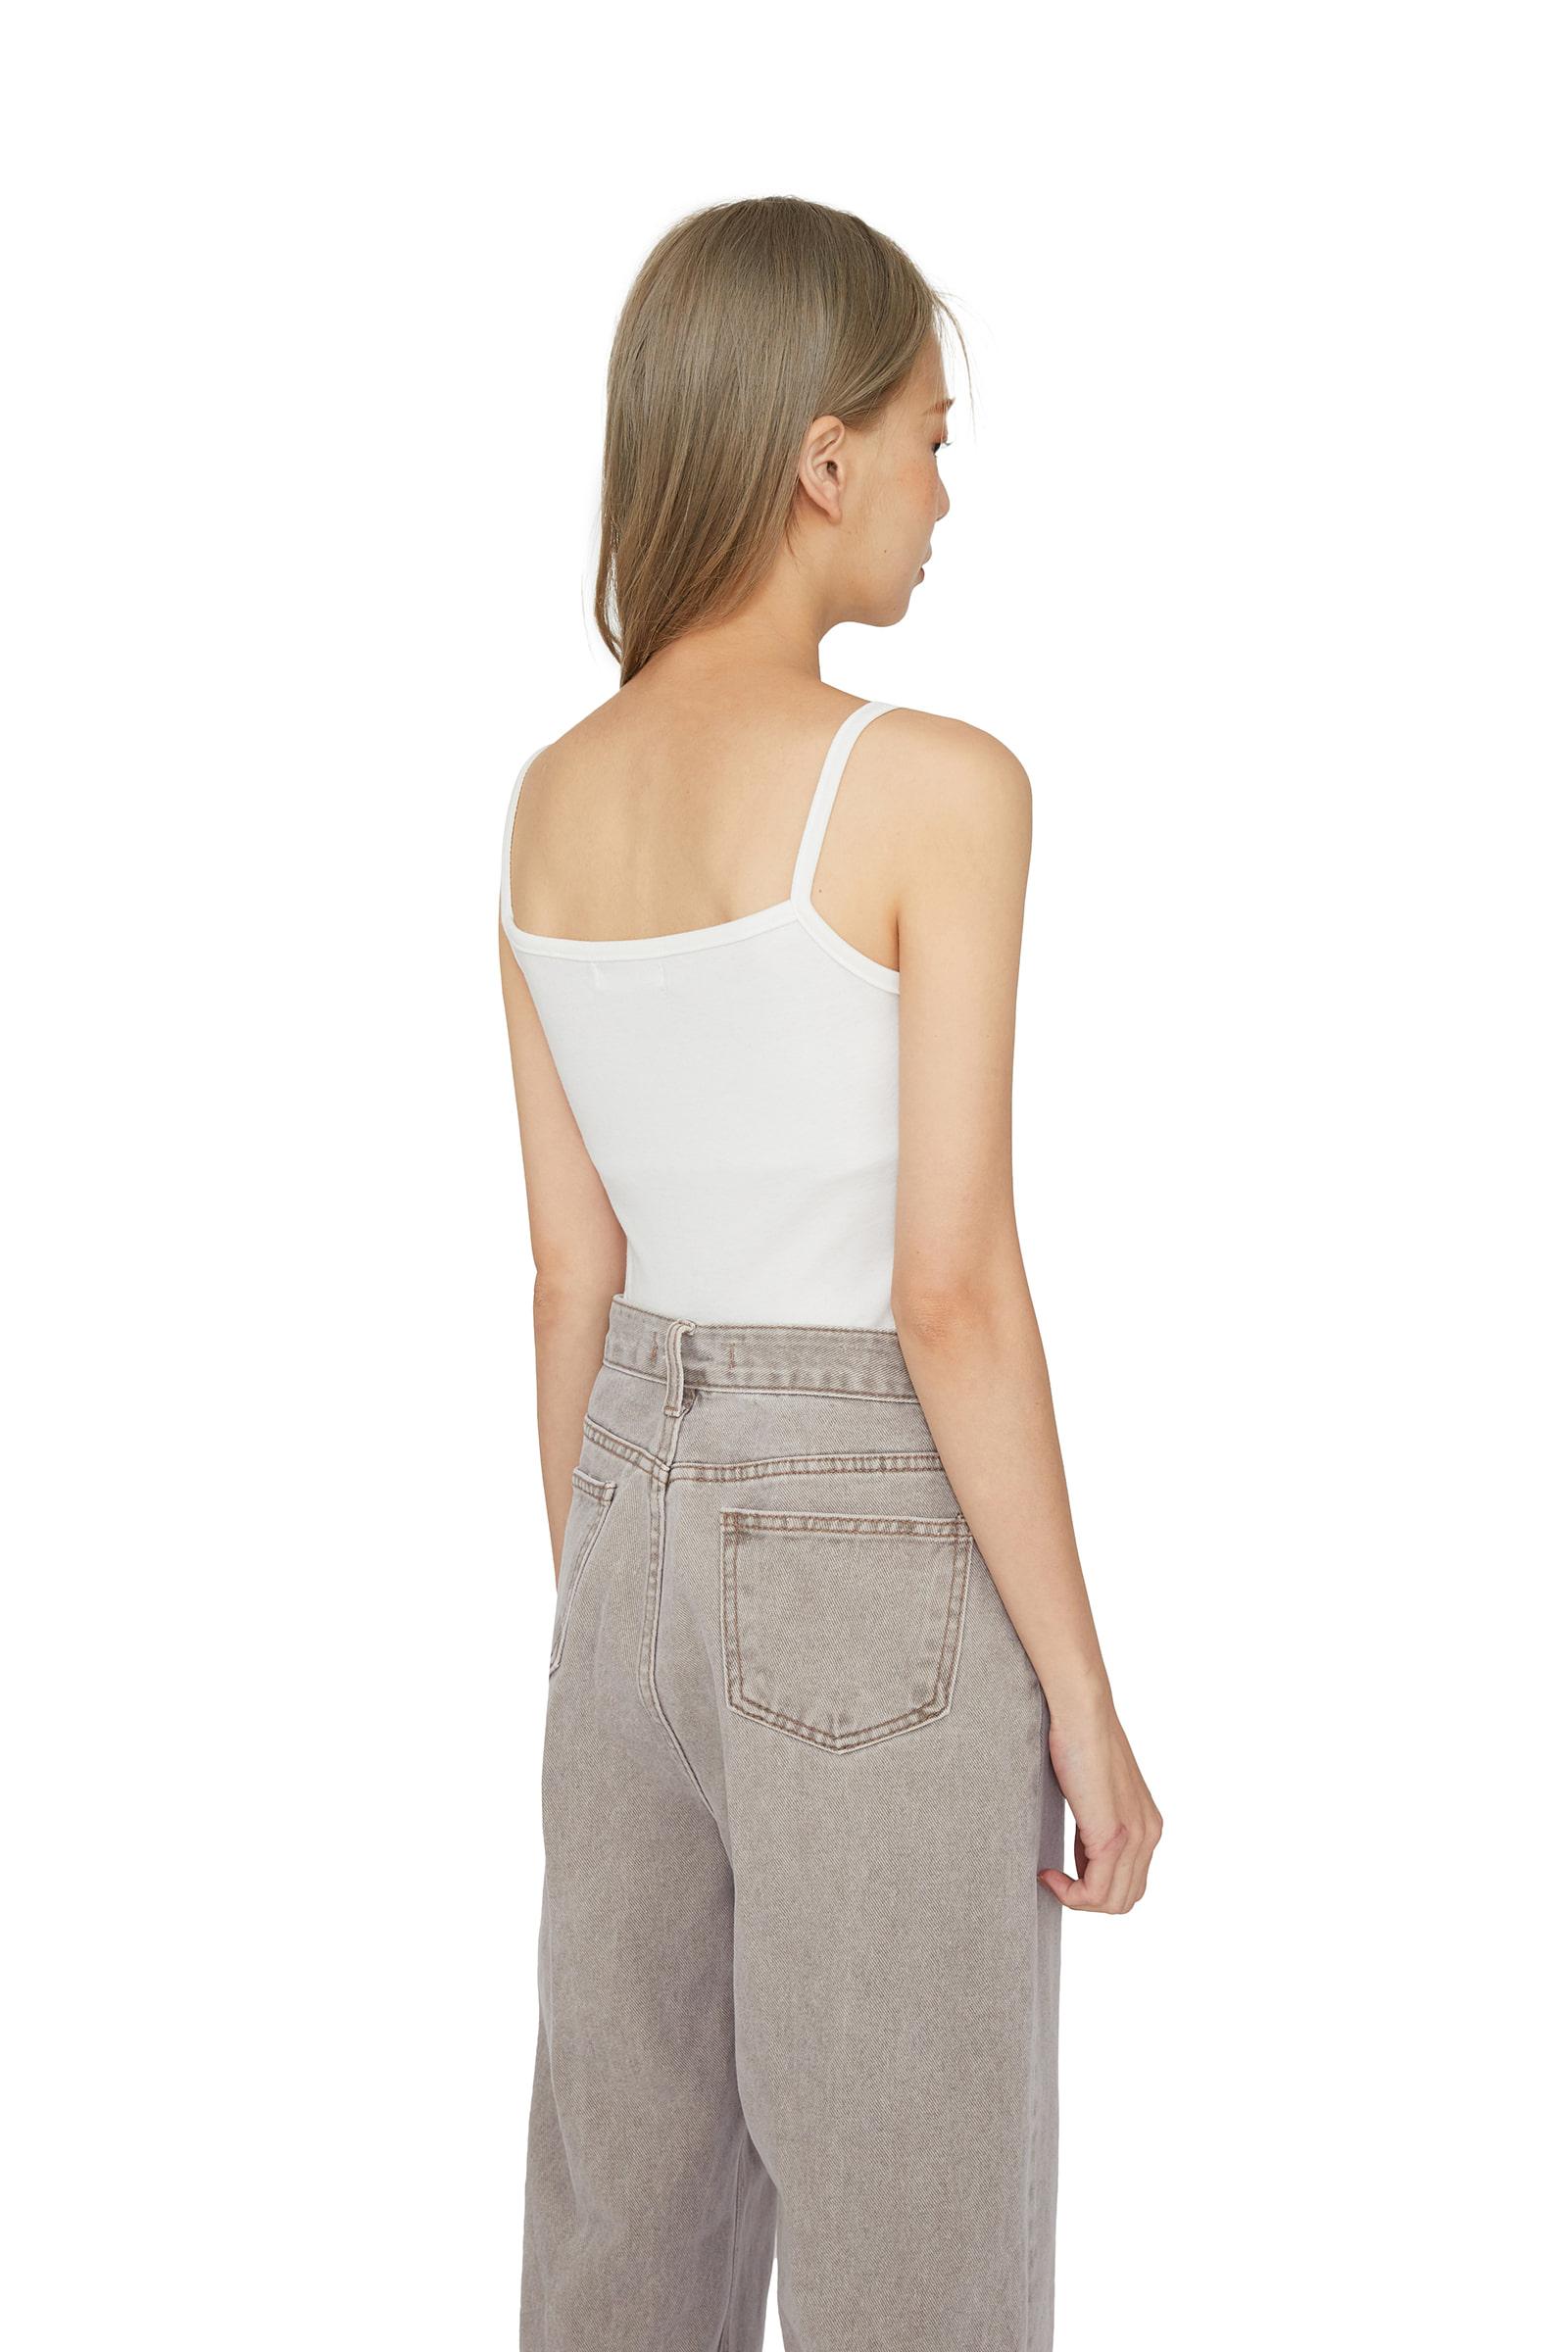 All-key slim sleeveless top